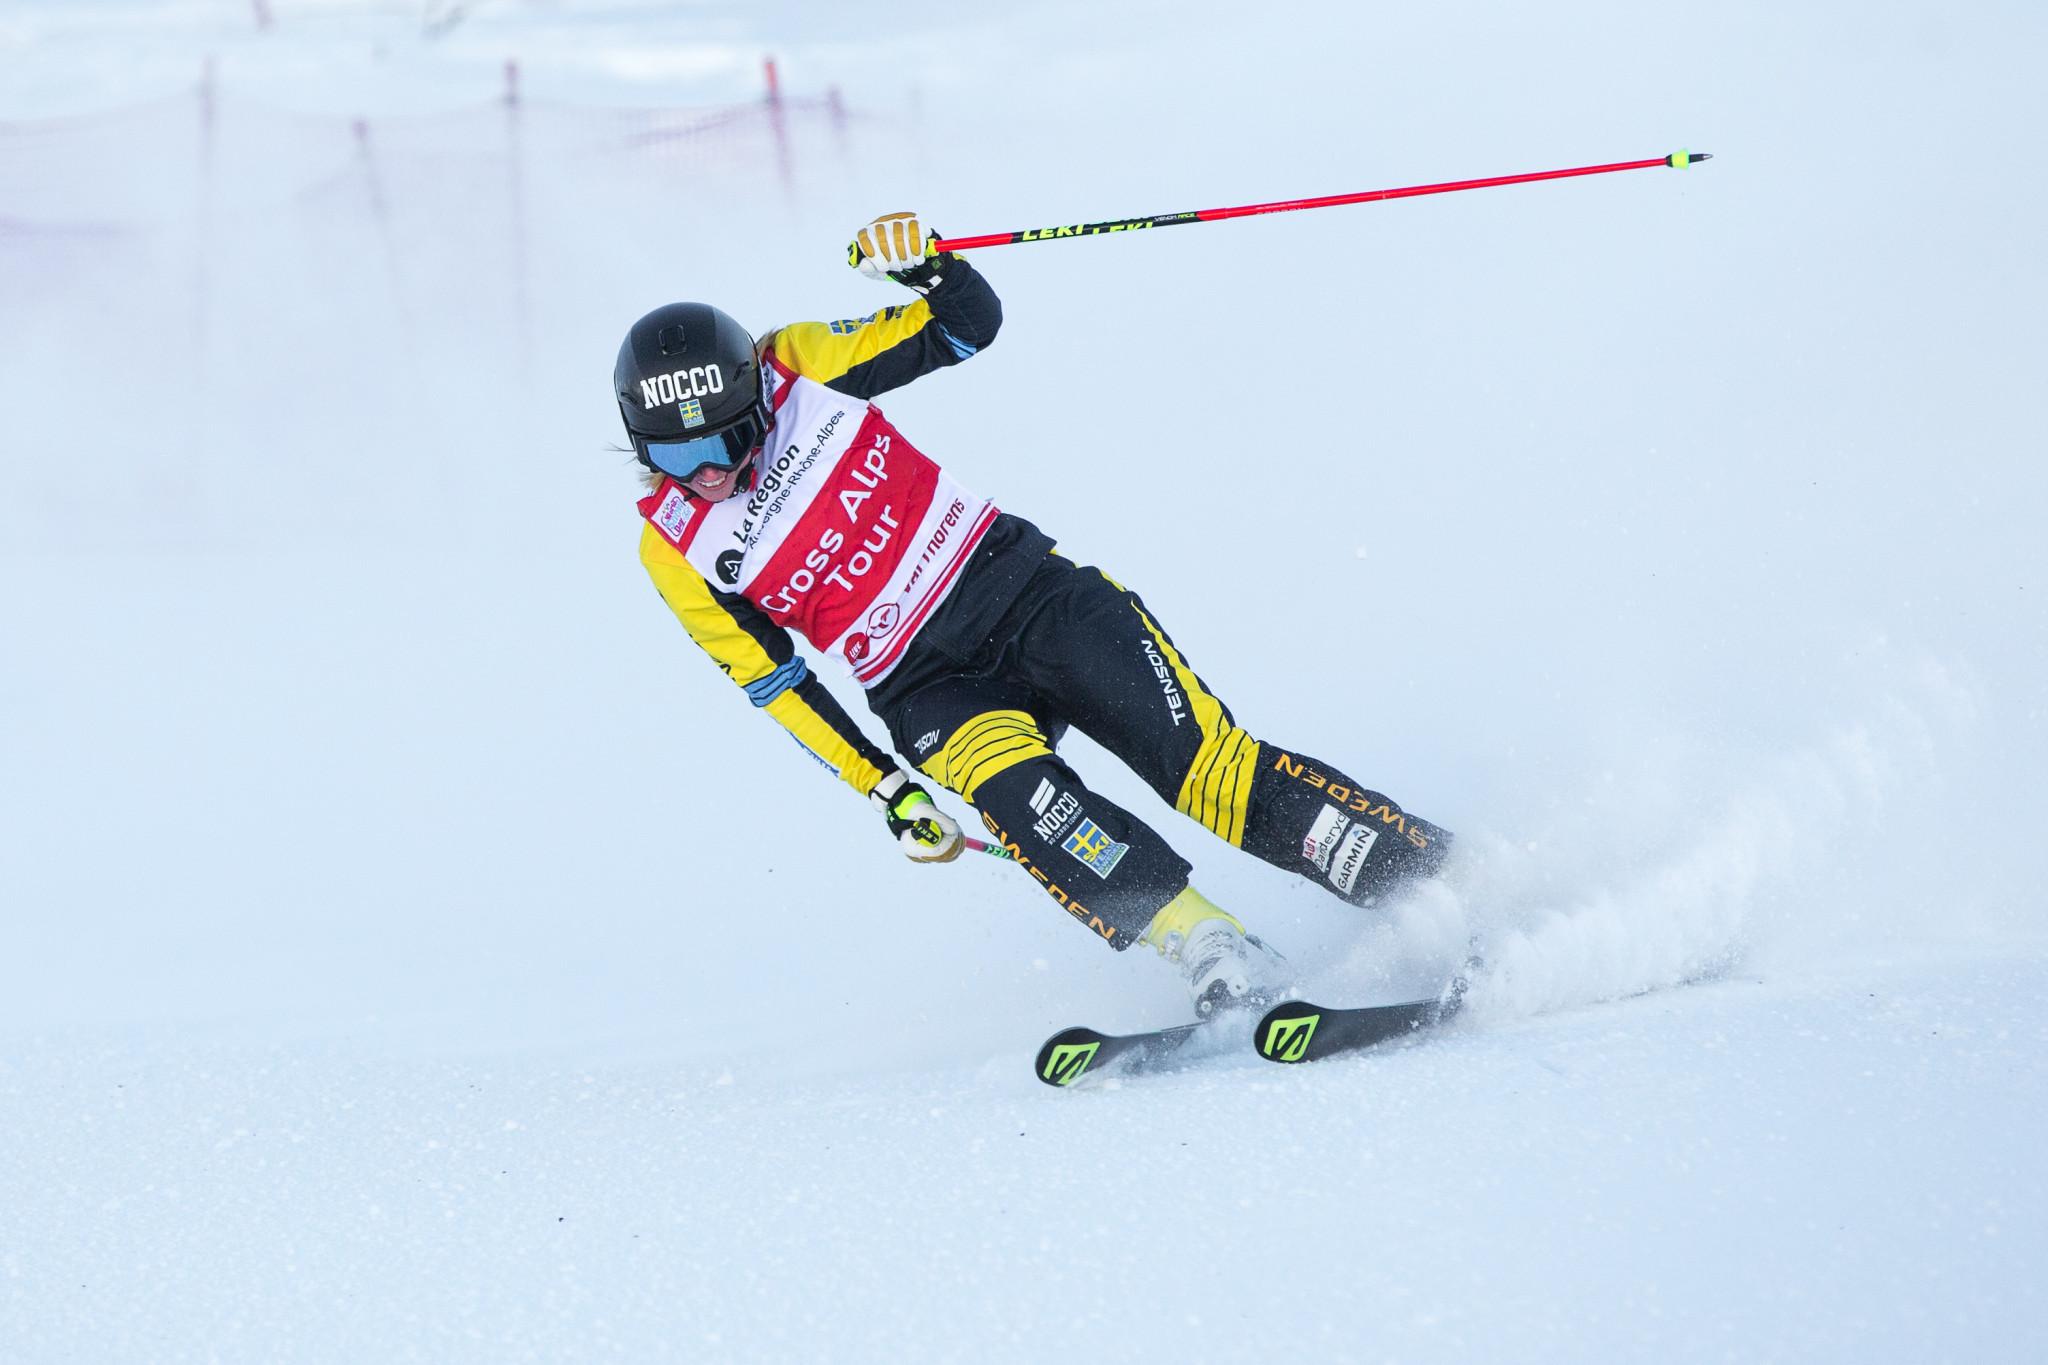 Naeslund justifies favourite tag as Ski Cross World Cup season begins